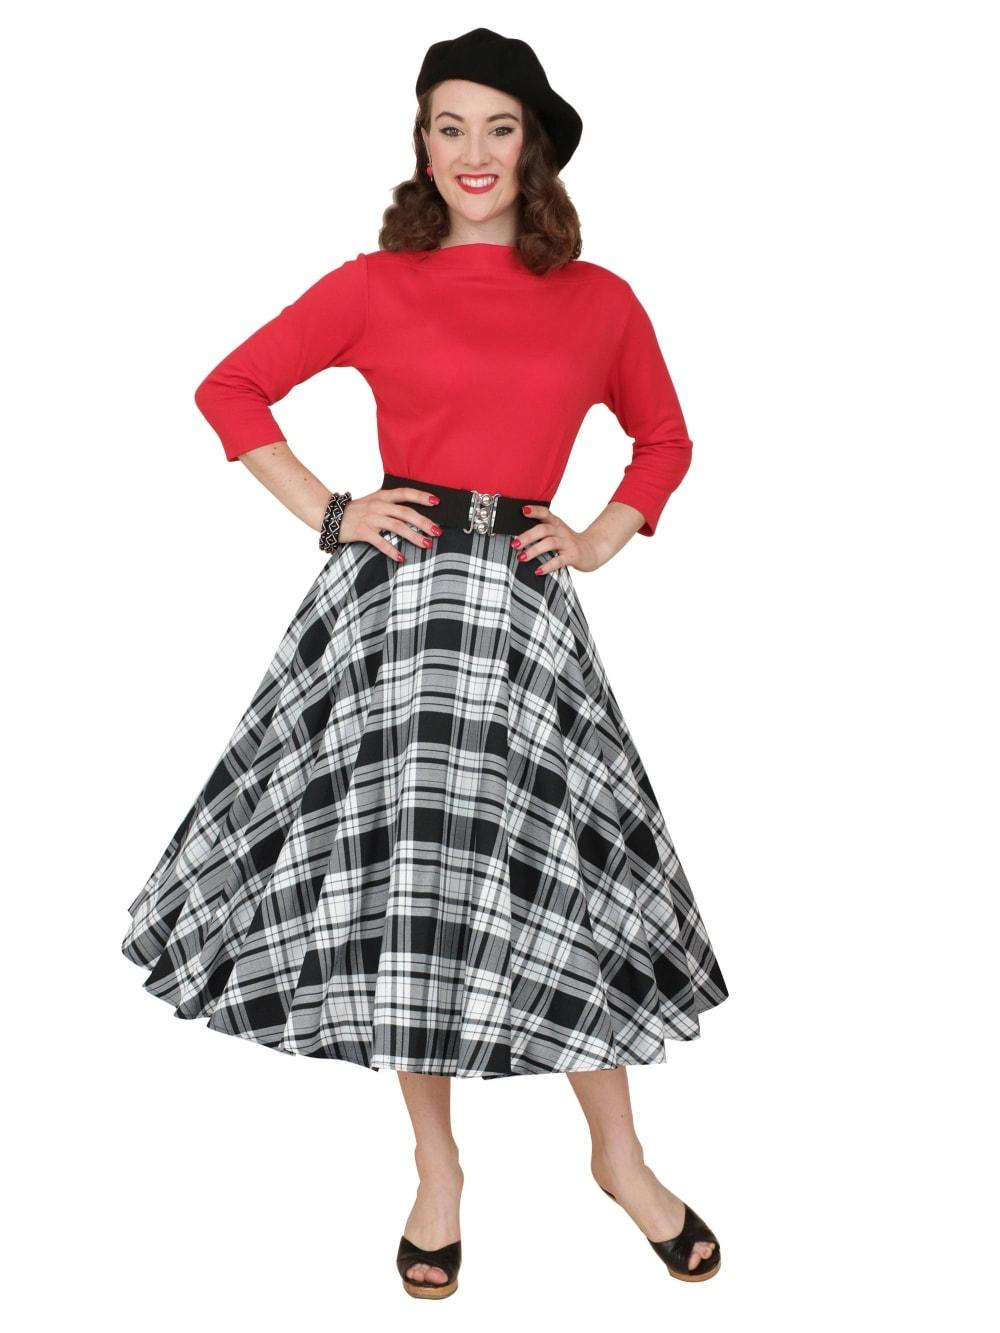 dd997d0efc9b 1950s Circle Skirt White Black Tartan from Vivien of Holloway